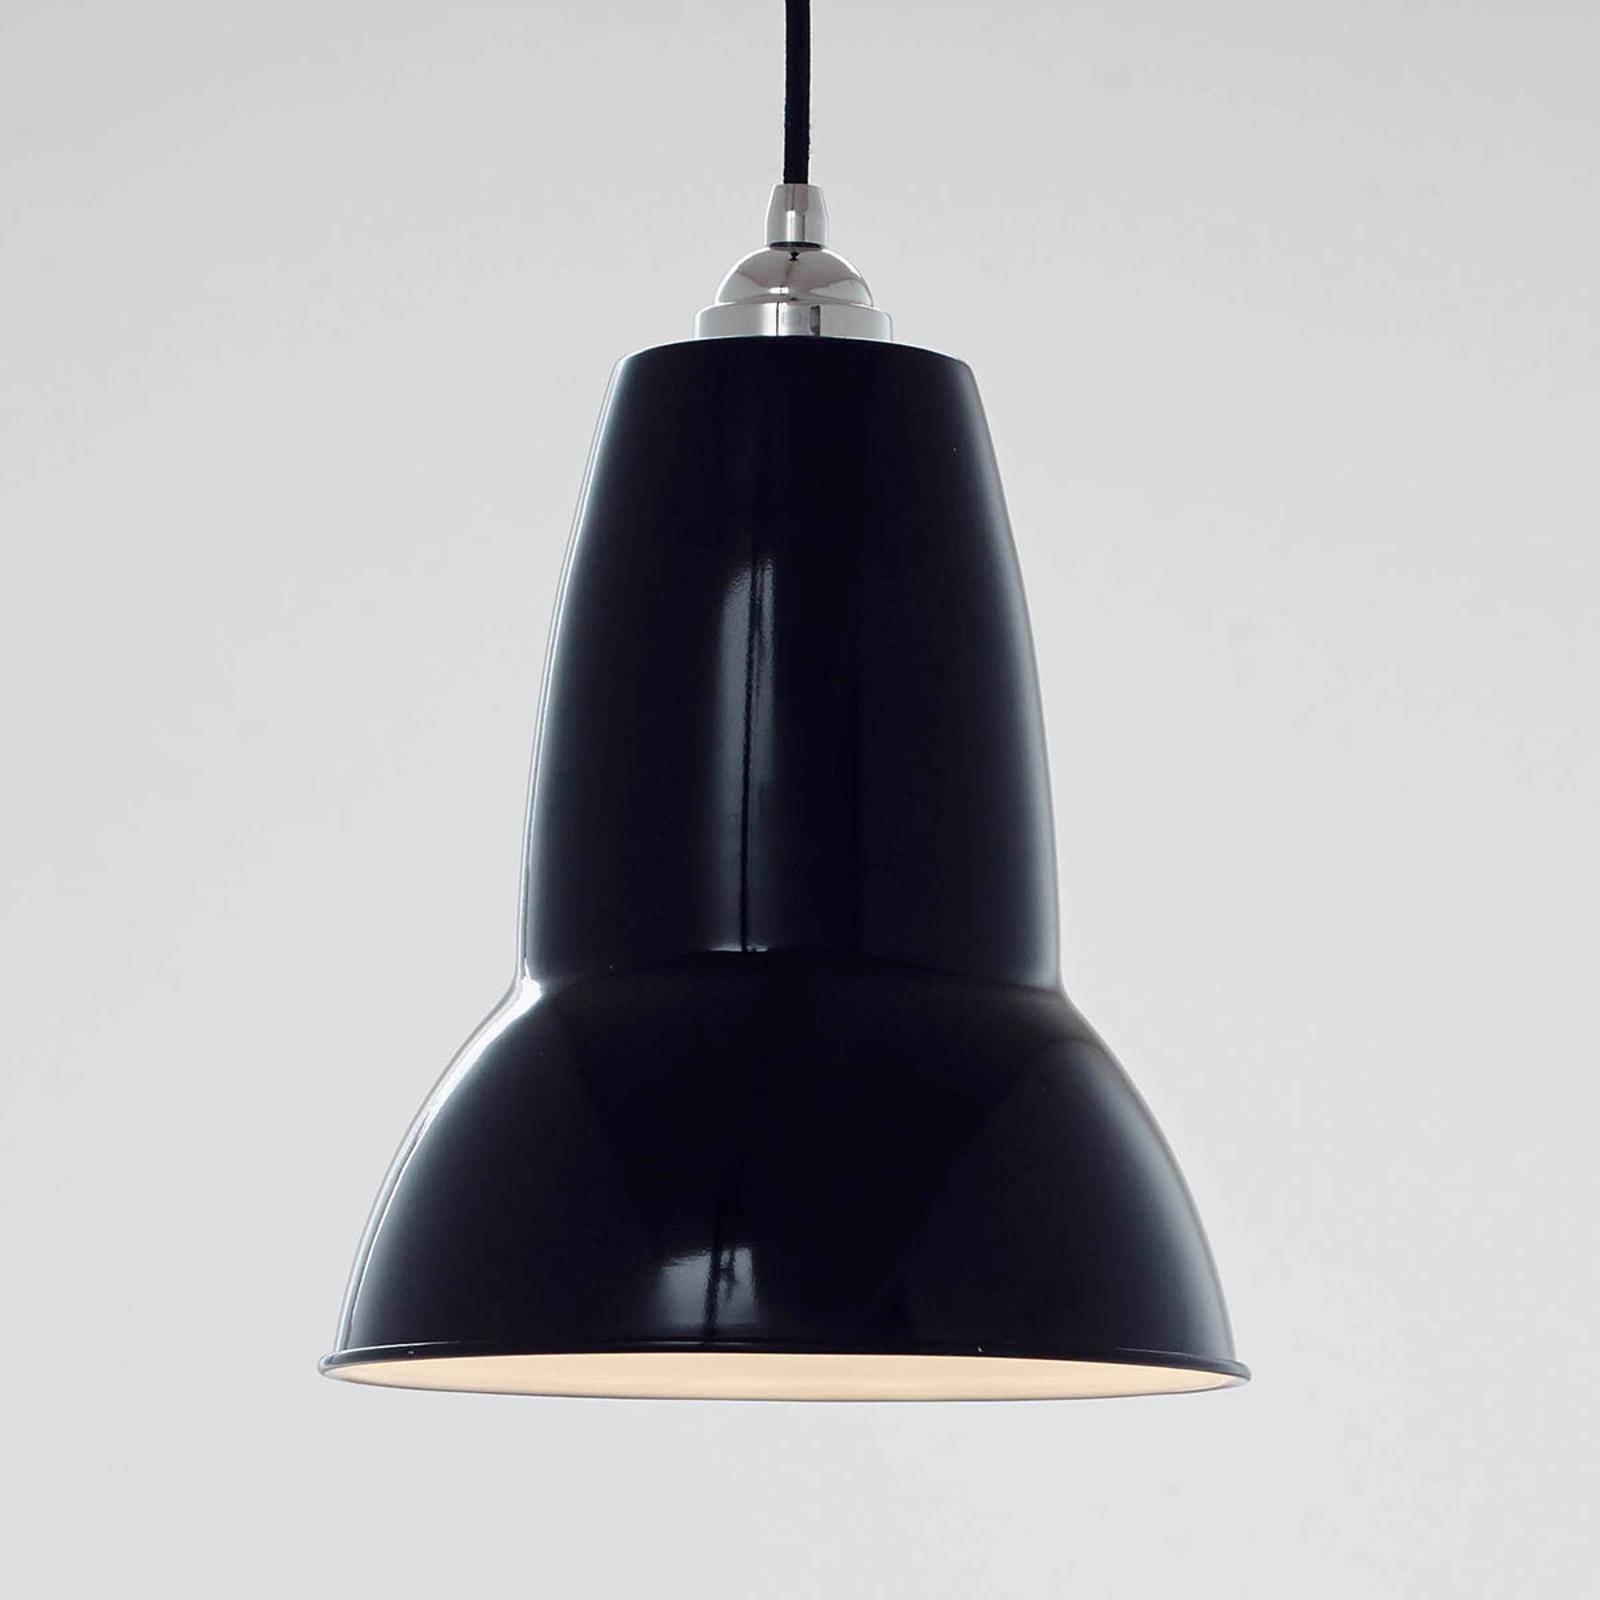 Acquista Anglepoise Original 1227 Maxi lampada sospensione